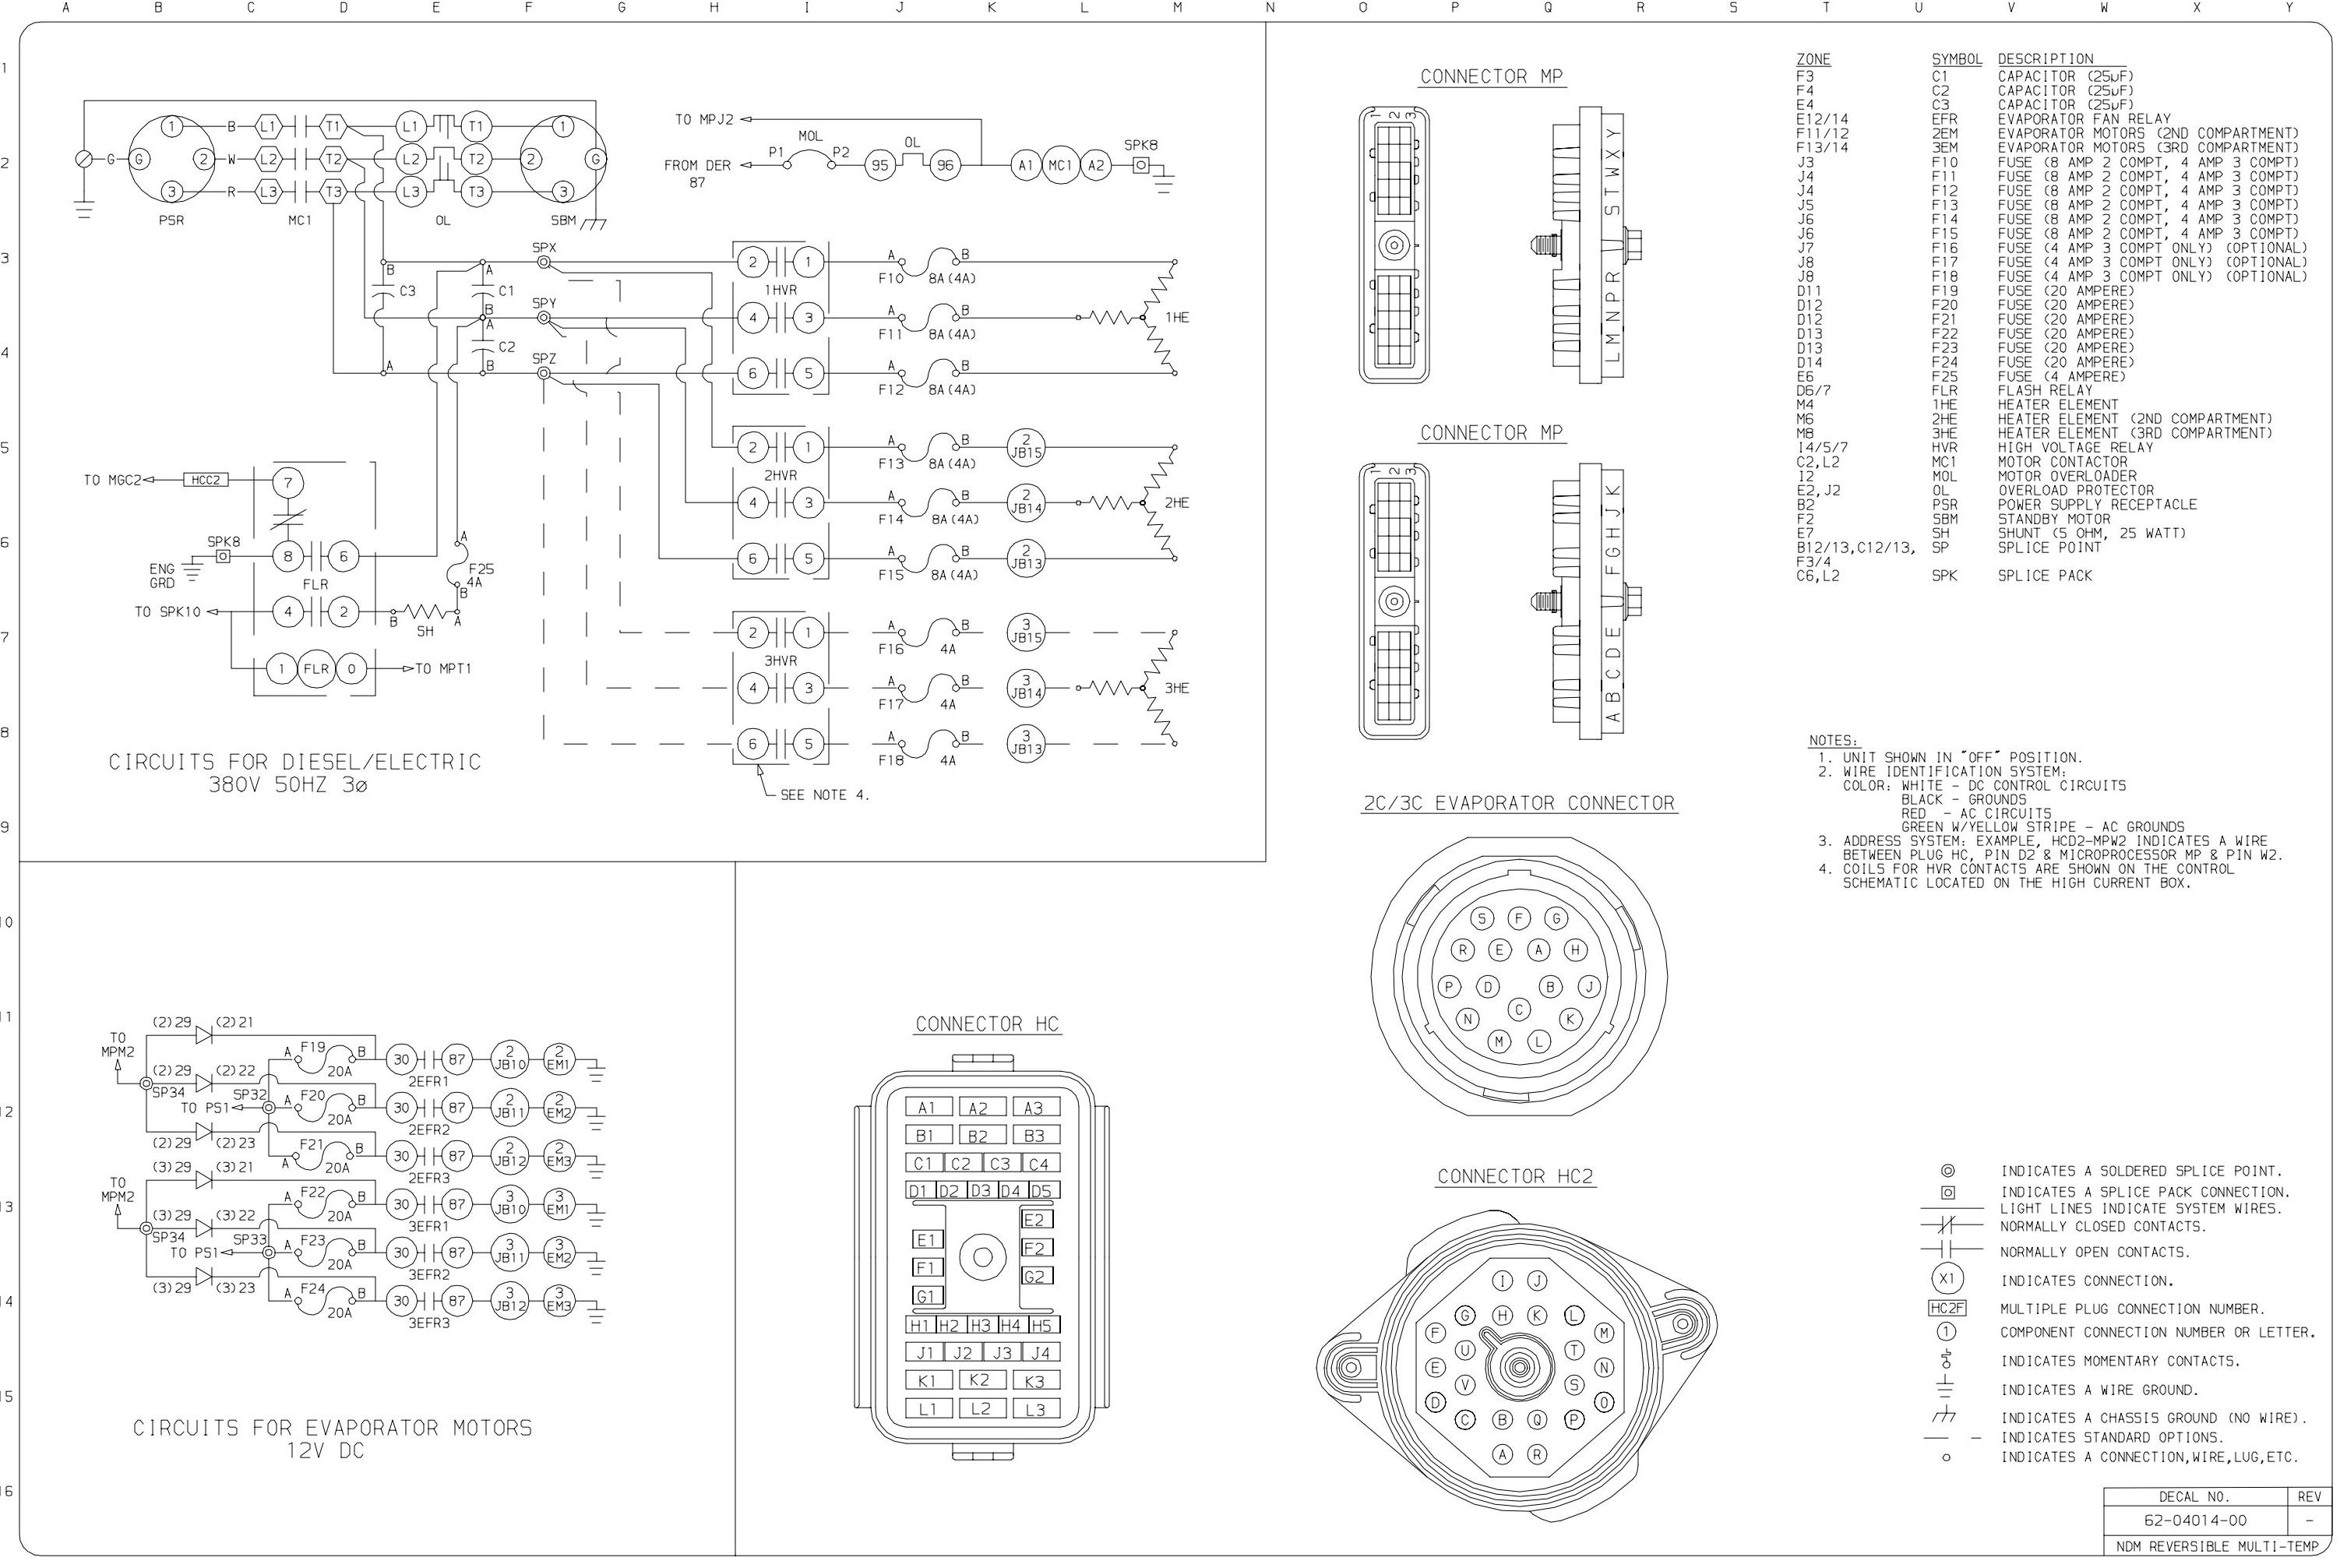 u0421 u0445 u0435 u043c u044b carrier genesis tm900  1000 multi